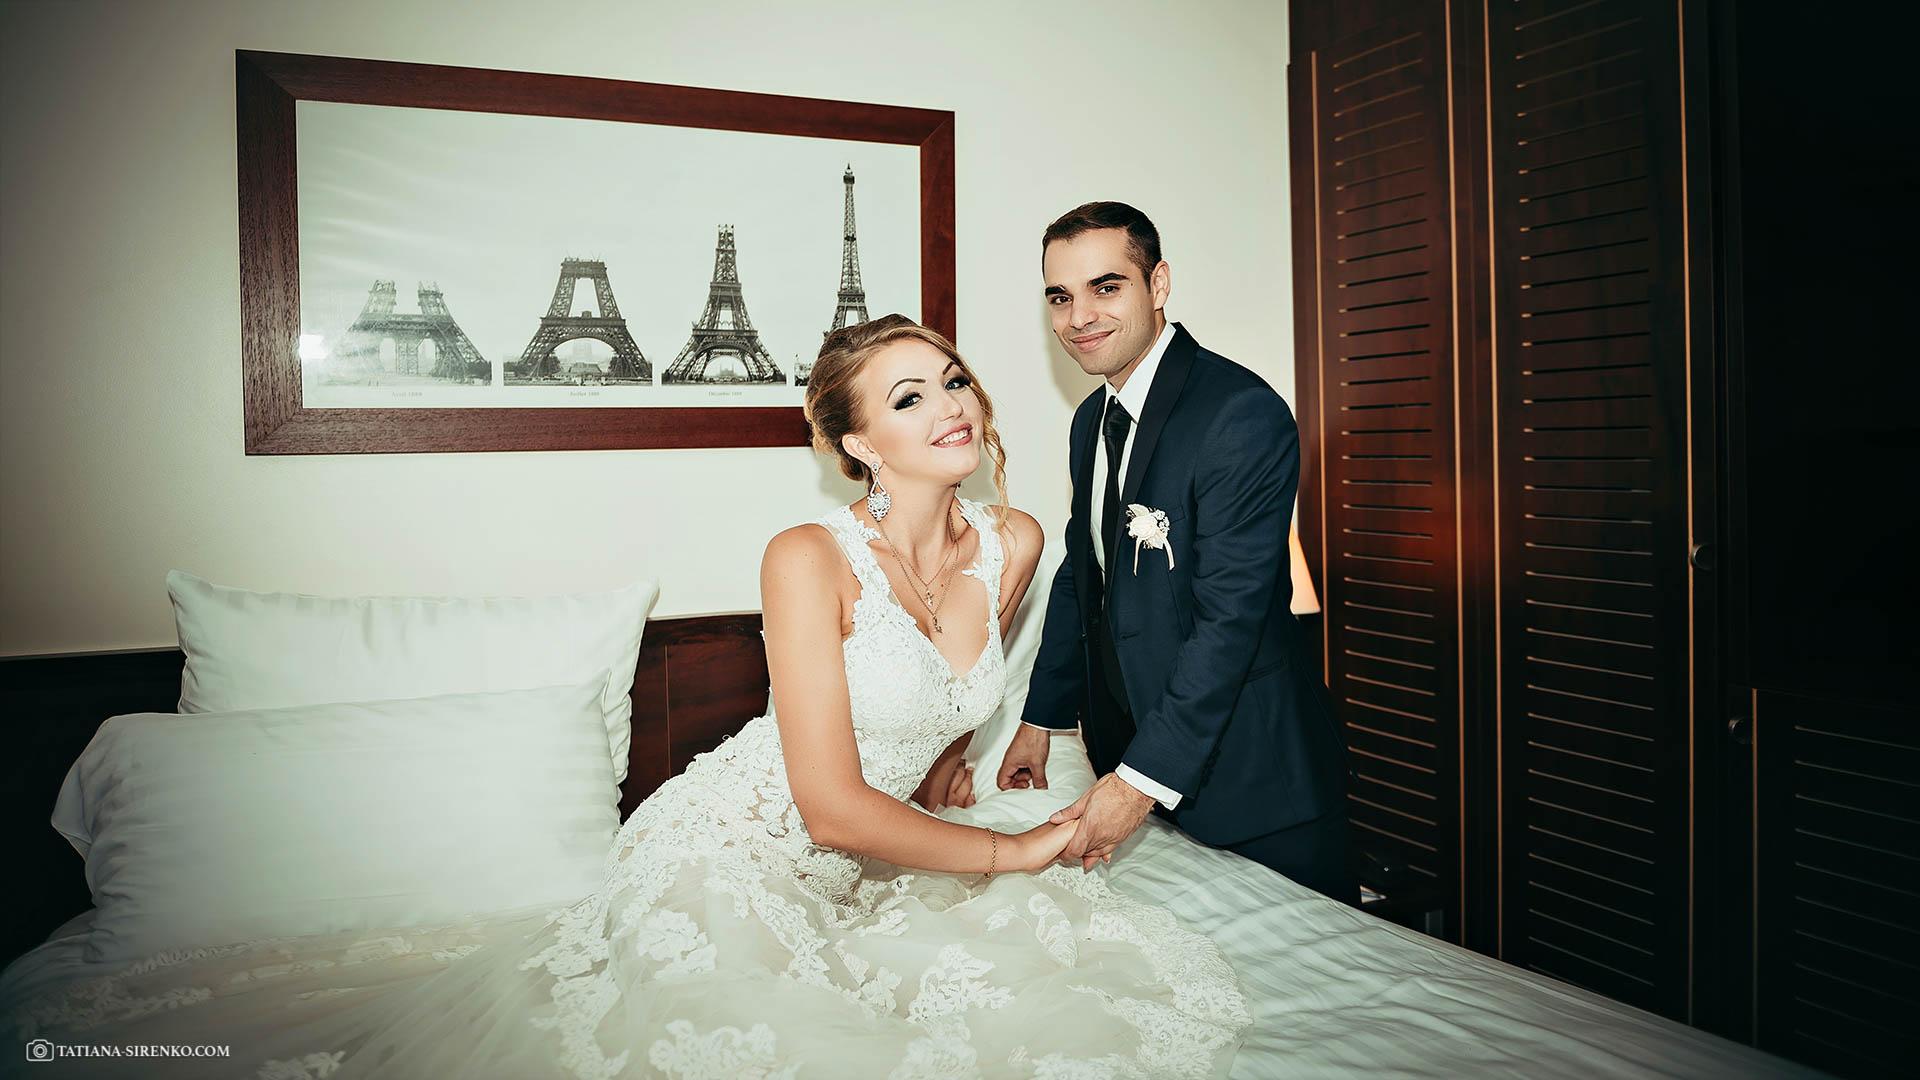 Свадебная фотосъемка Париж